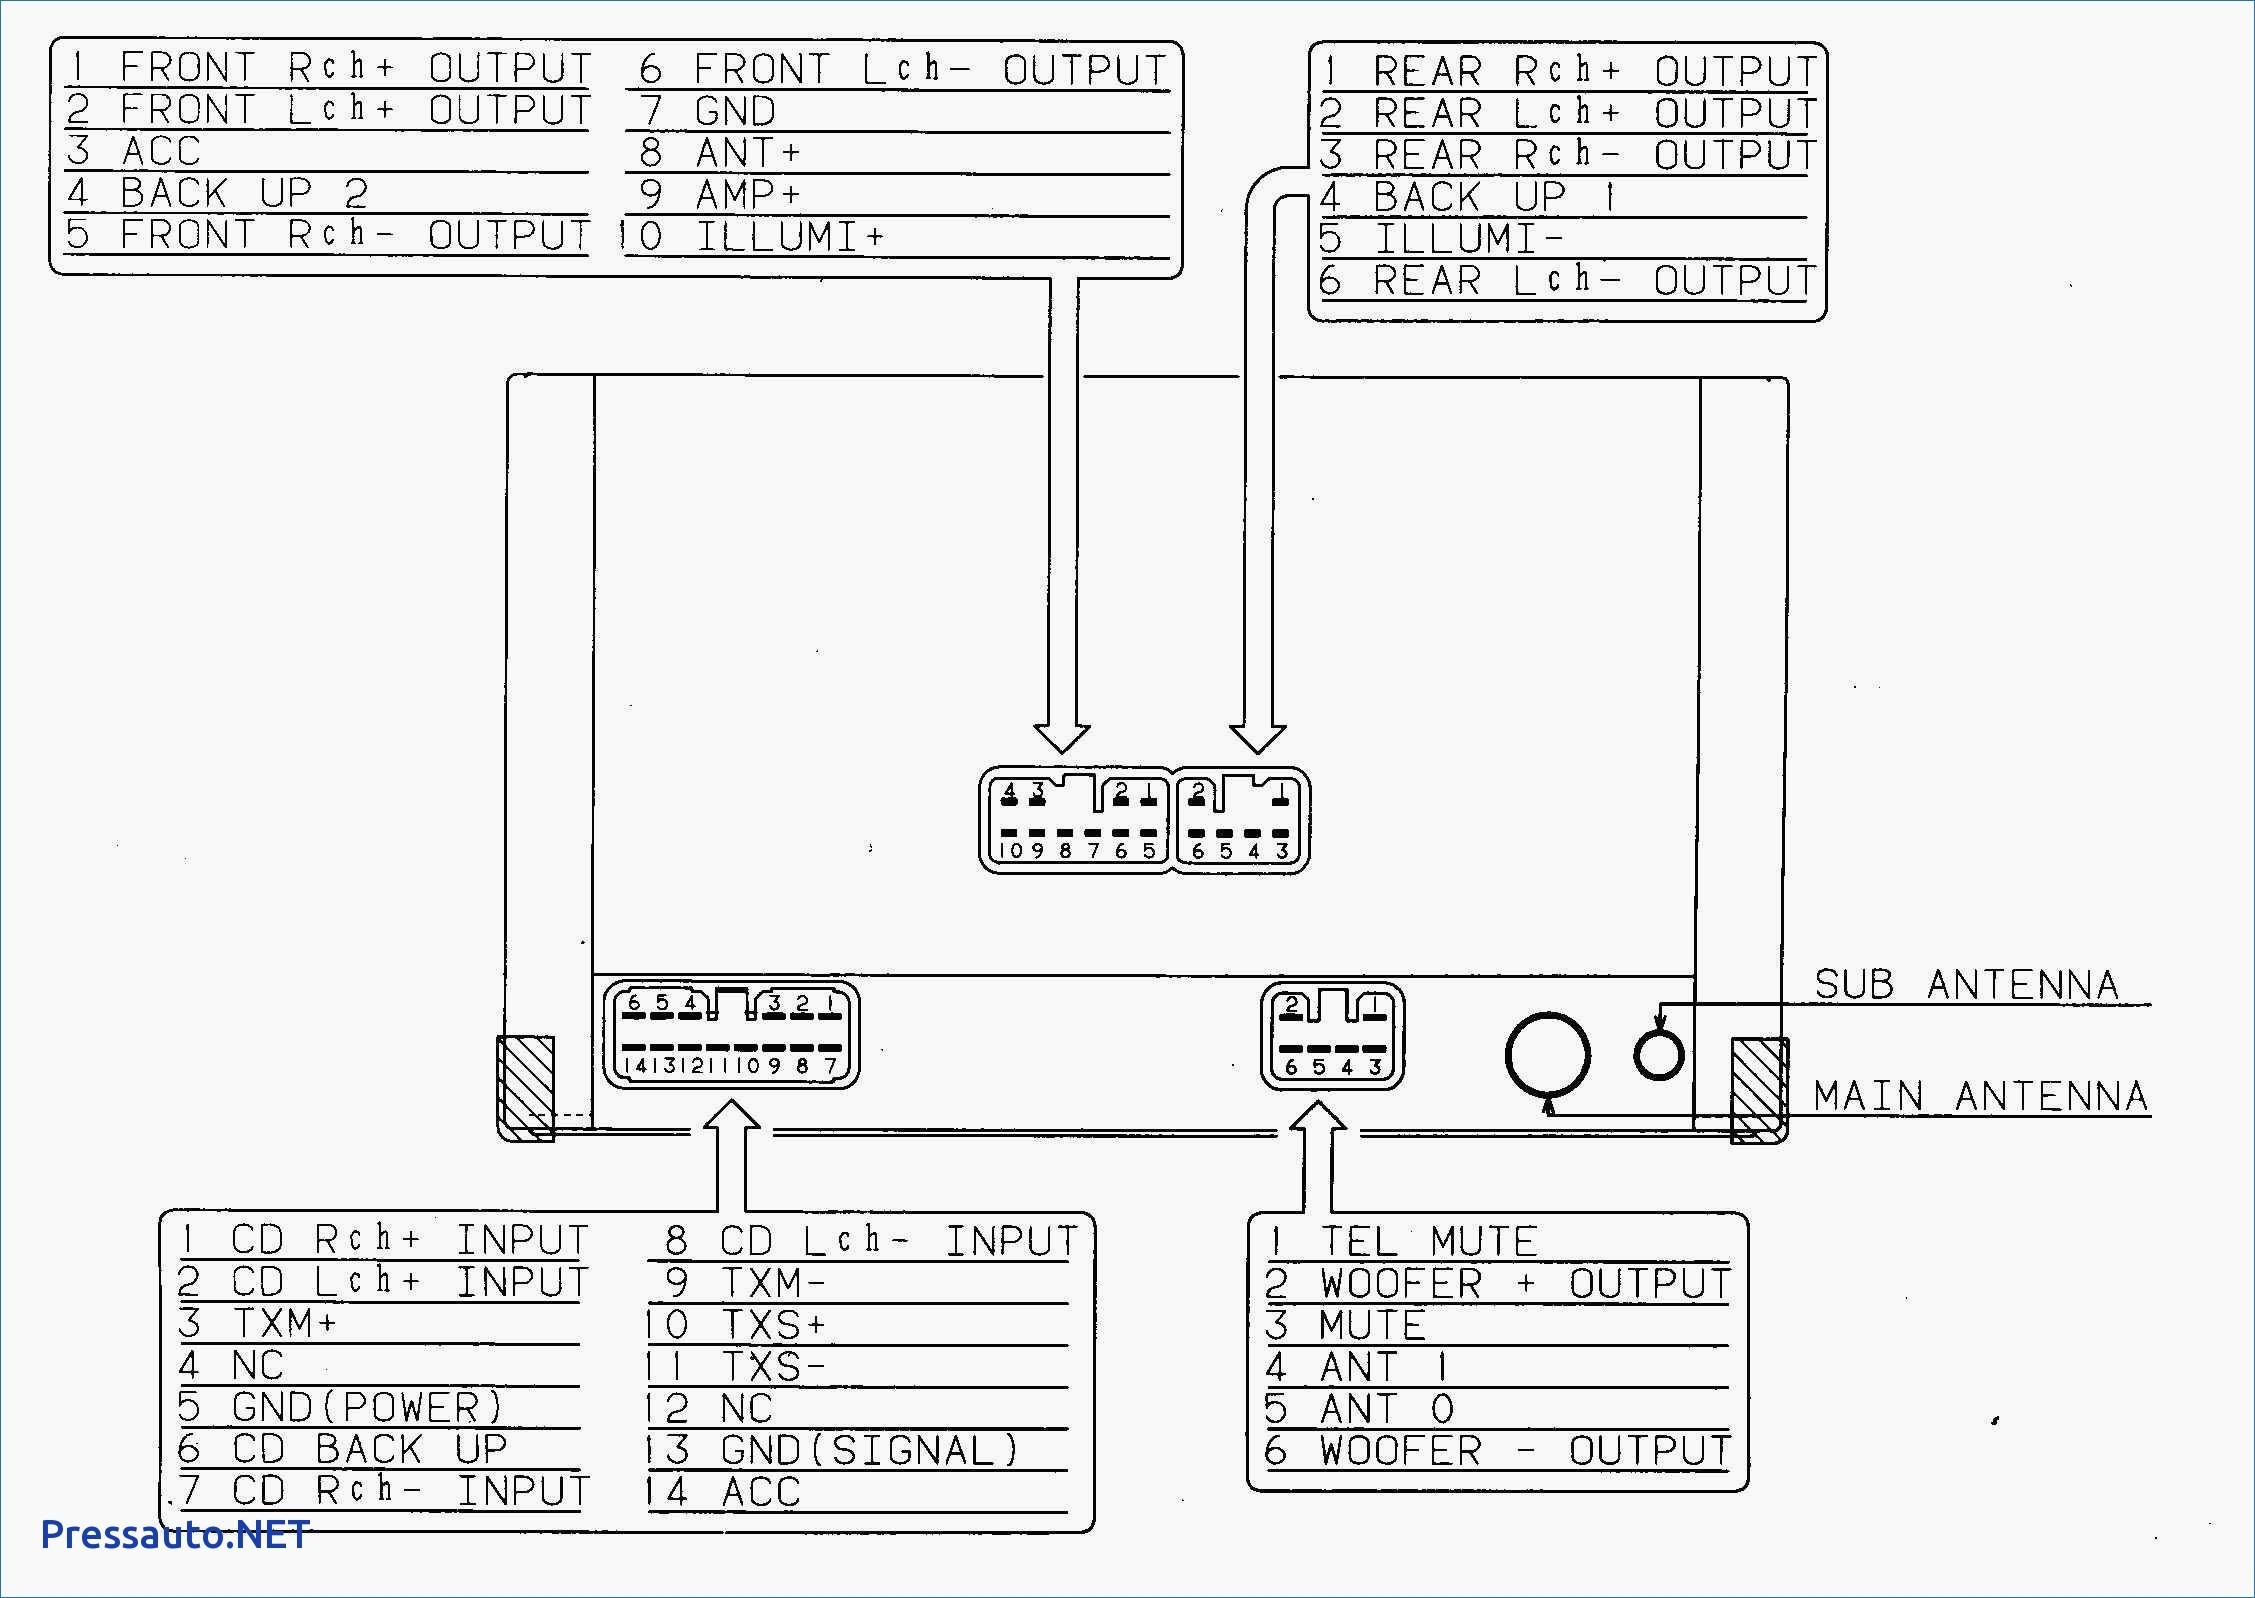 Clifford Car Alarm Wiring Diagram 28 Bulldog Car Wiring Diagrams Pressauto Net with Security In Of Clifford Car Alarm Wiring Diagram